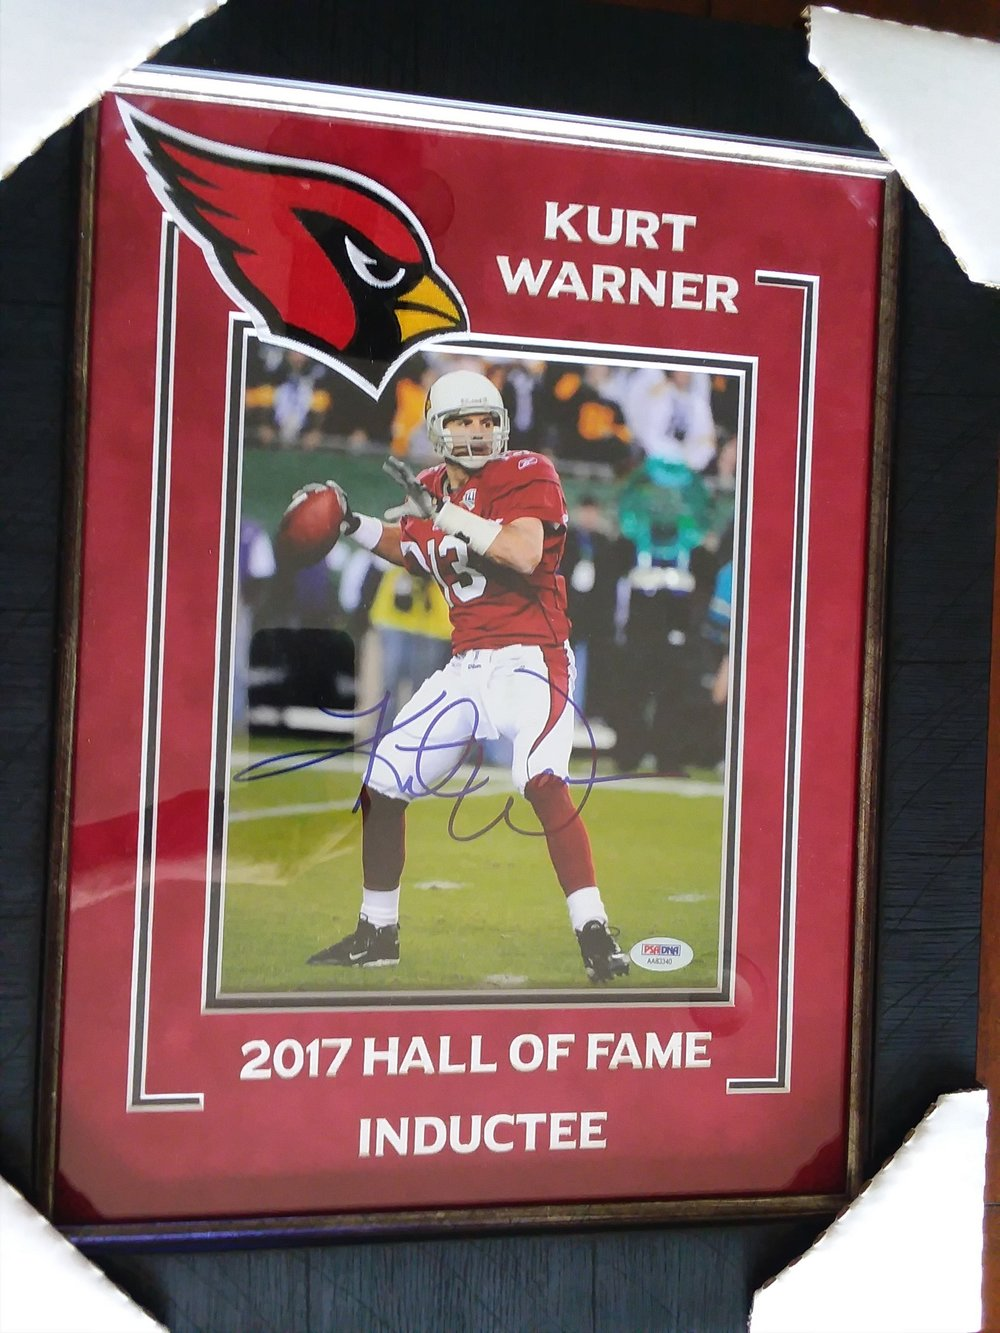 Autographed Kurt Warner Photo - Donated by Wayne and Marlene Anderson